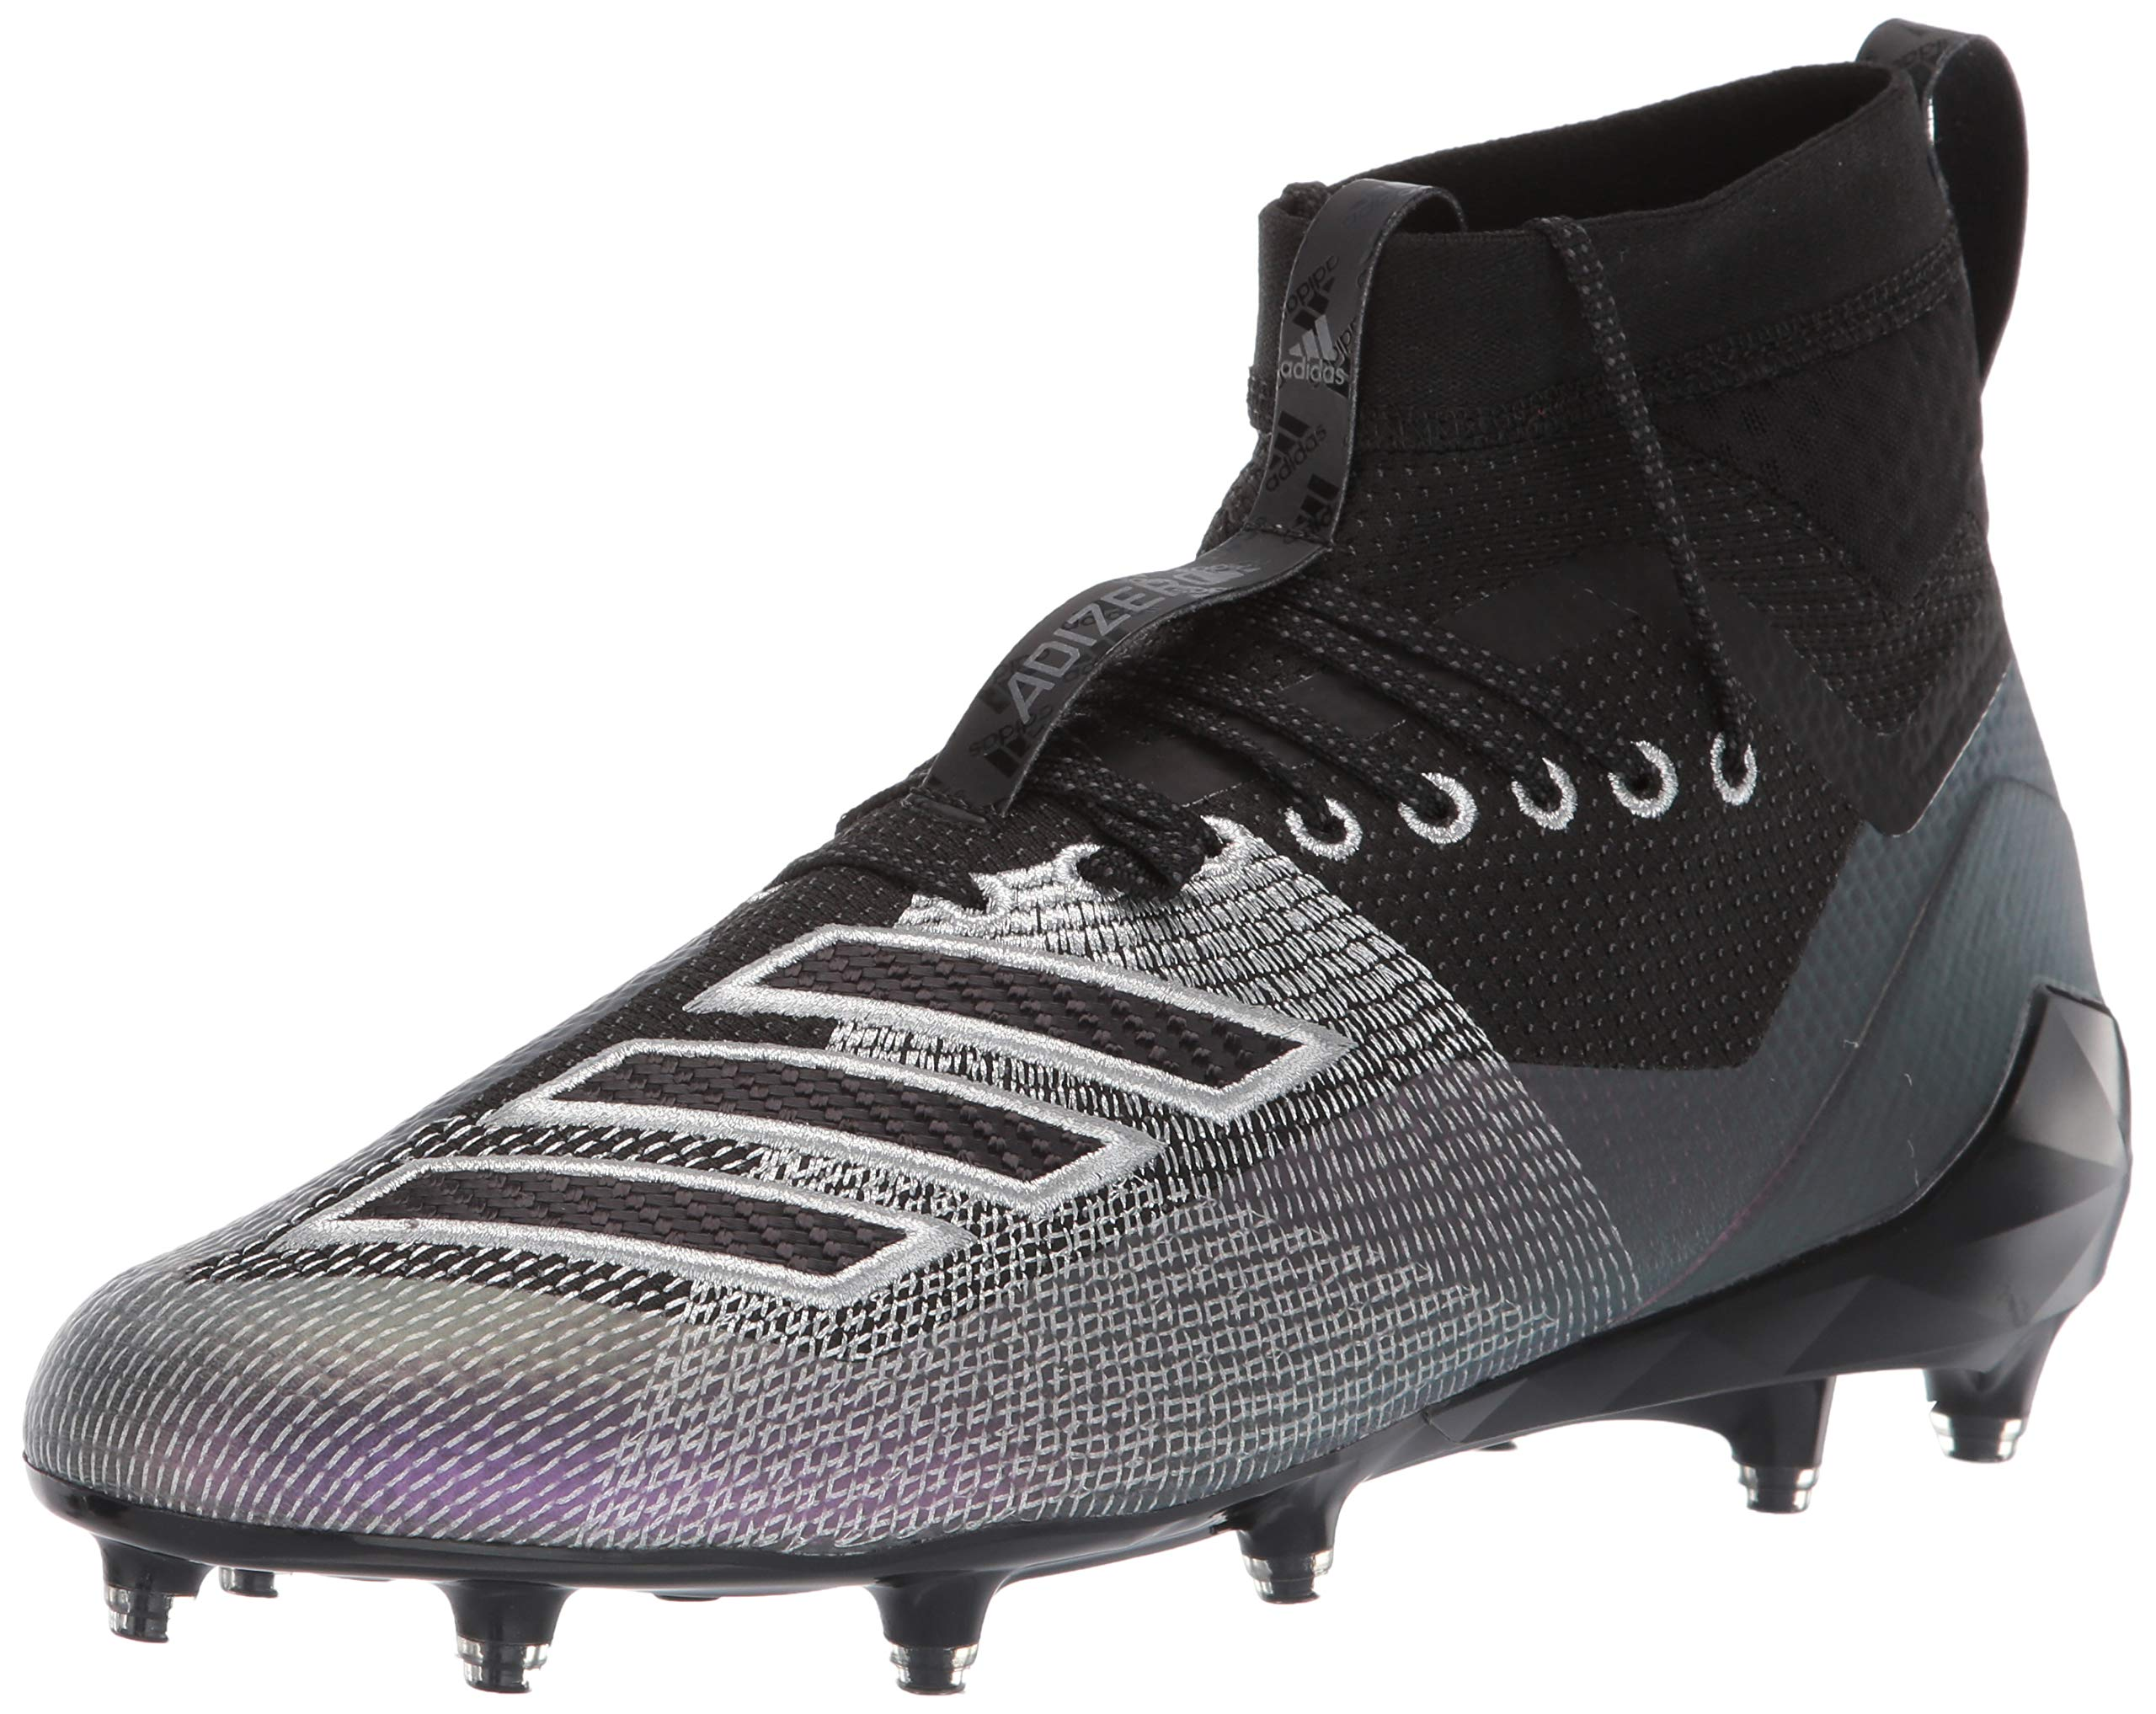 adidas Men's Adizero 8.0 SK Football Shoe, Black/Night Metallic/Grey, 17 M US by adidas